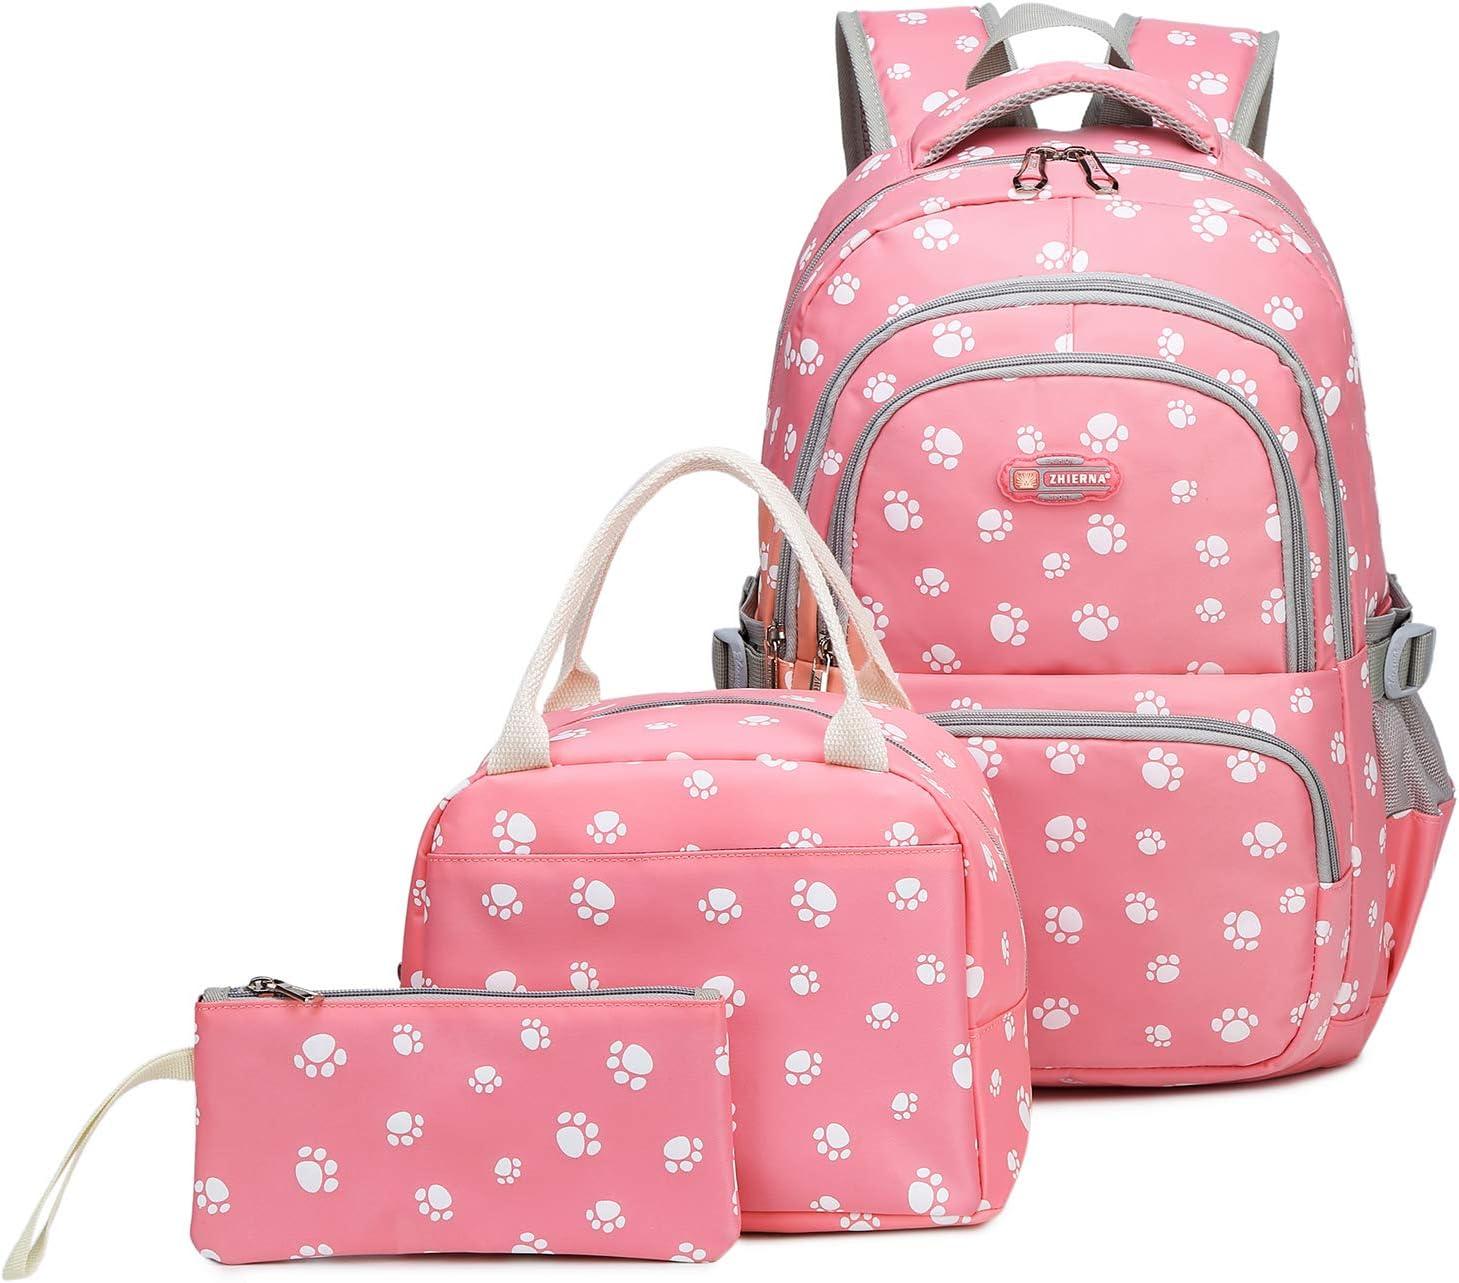 Happy Camper Backpack for Teens Personalize Backpack Kids Monogrammed Backpack Rucksack